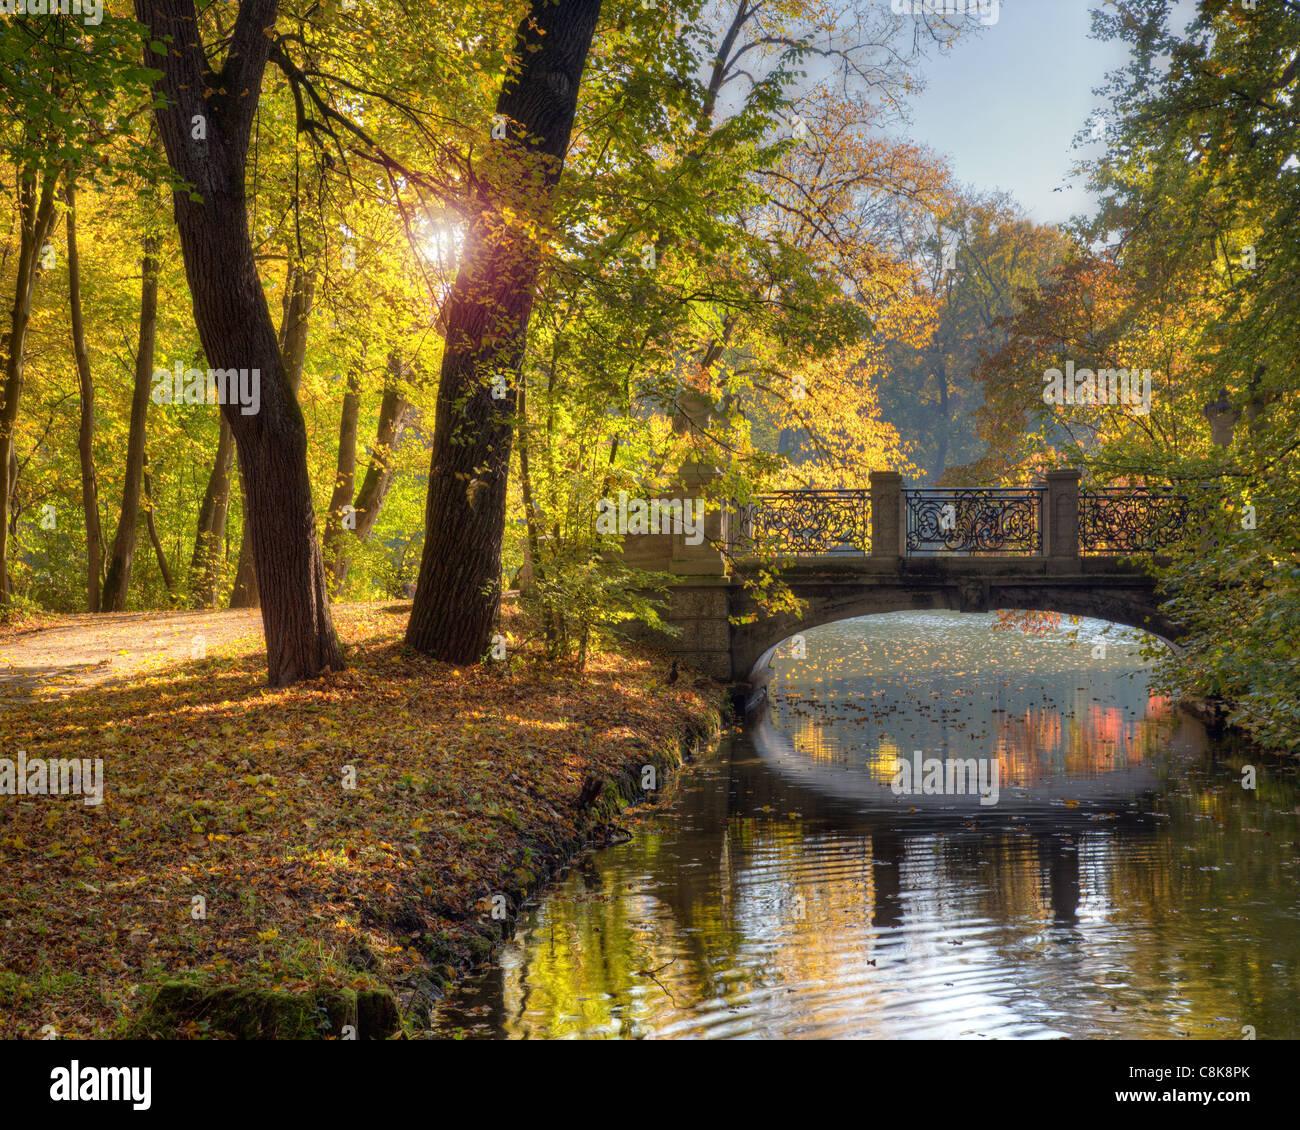 de bavaria autumn in nymphenburg castle park munich stock photo royalty free image. Black Bedroom Furniture Sets. Home Design Ideas